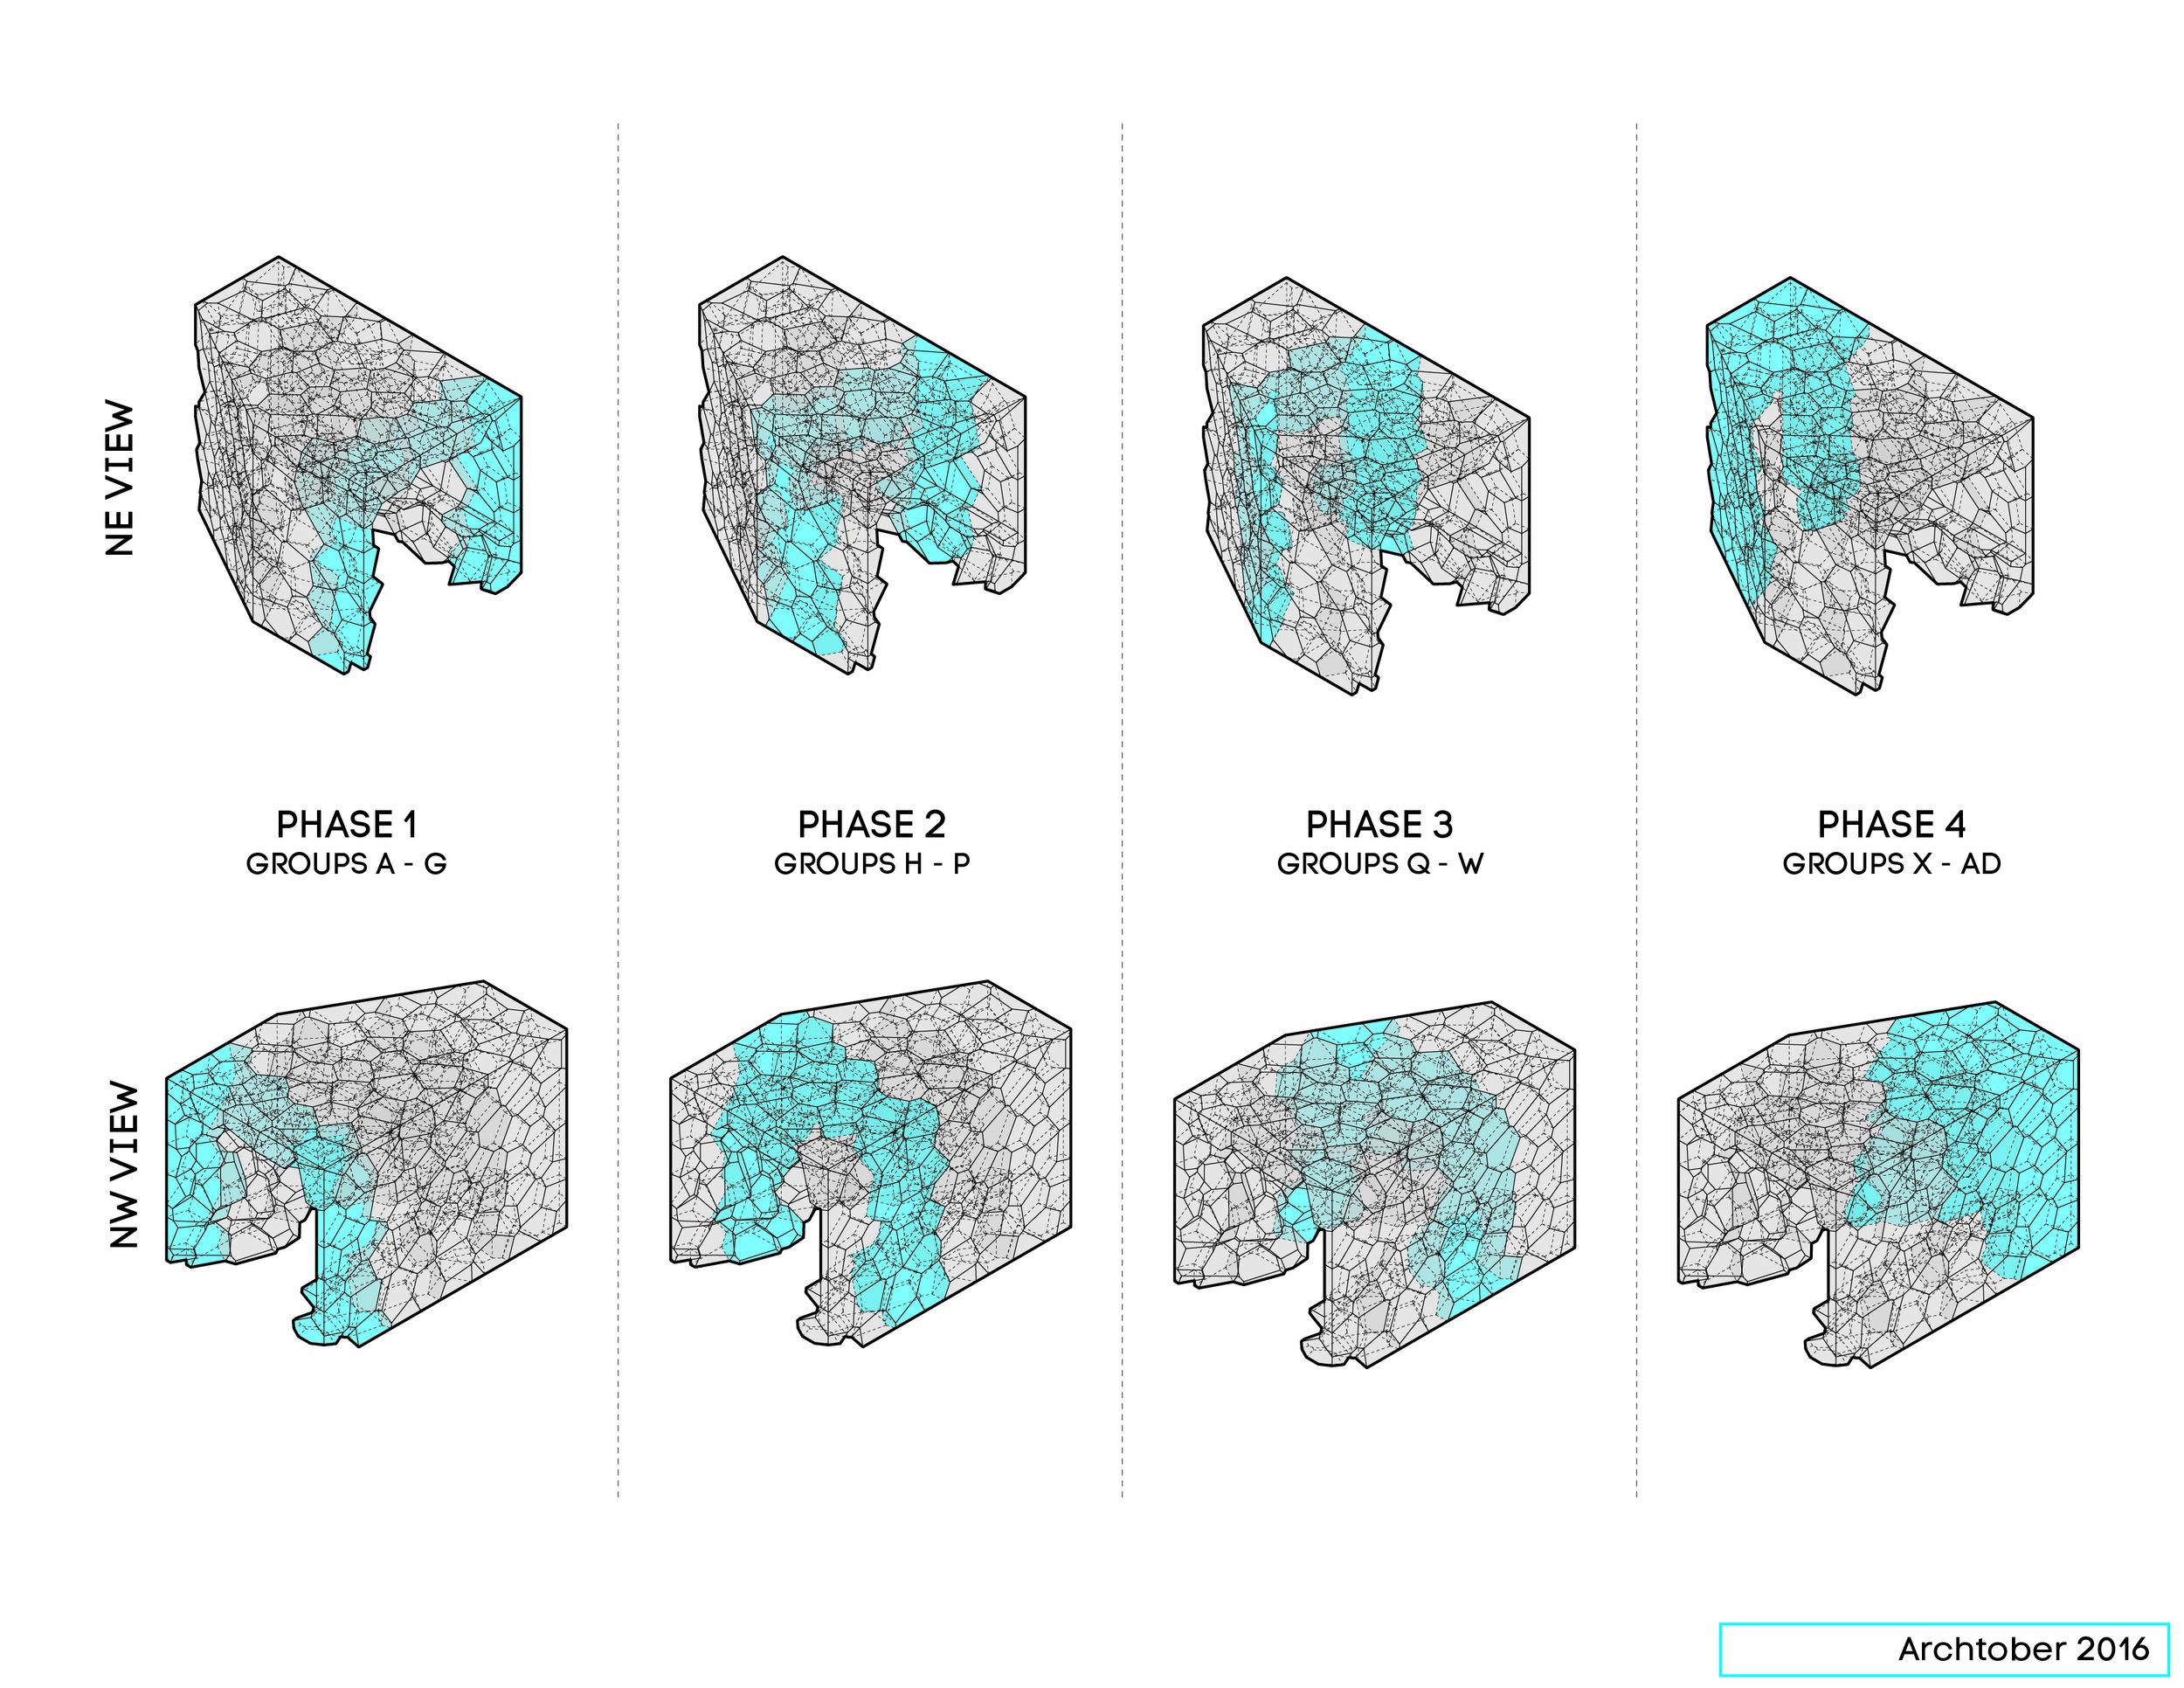 091216_assembly drawings-01.jpg